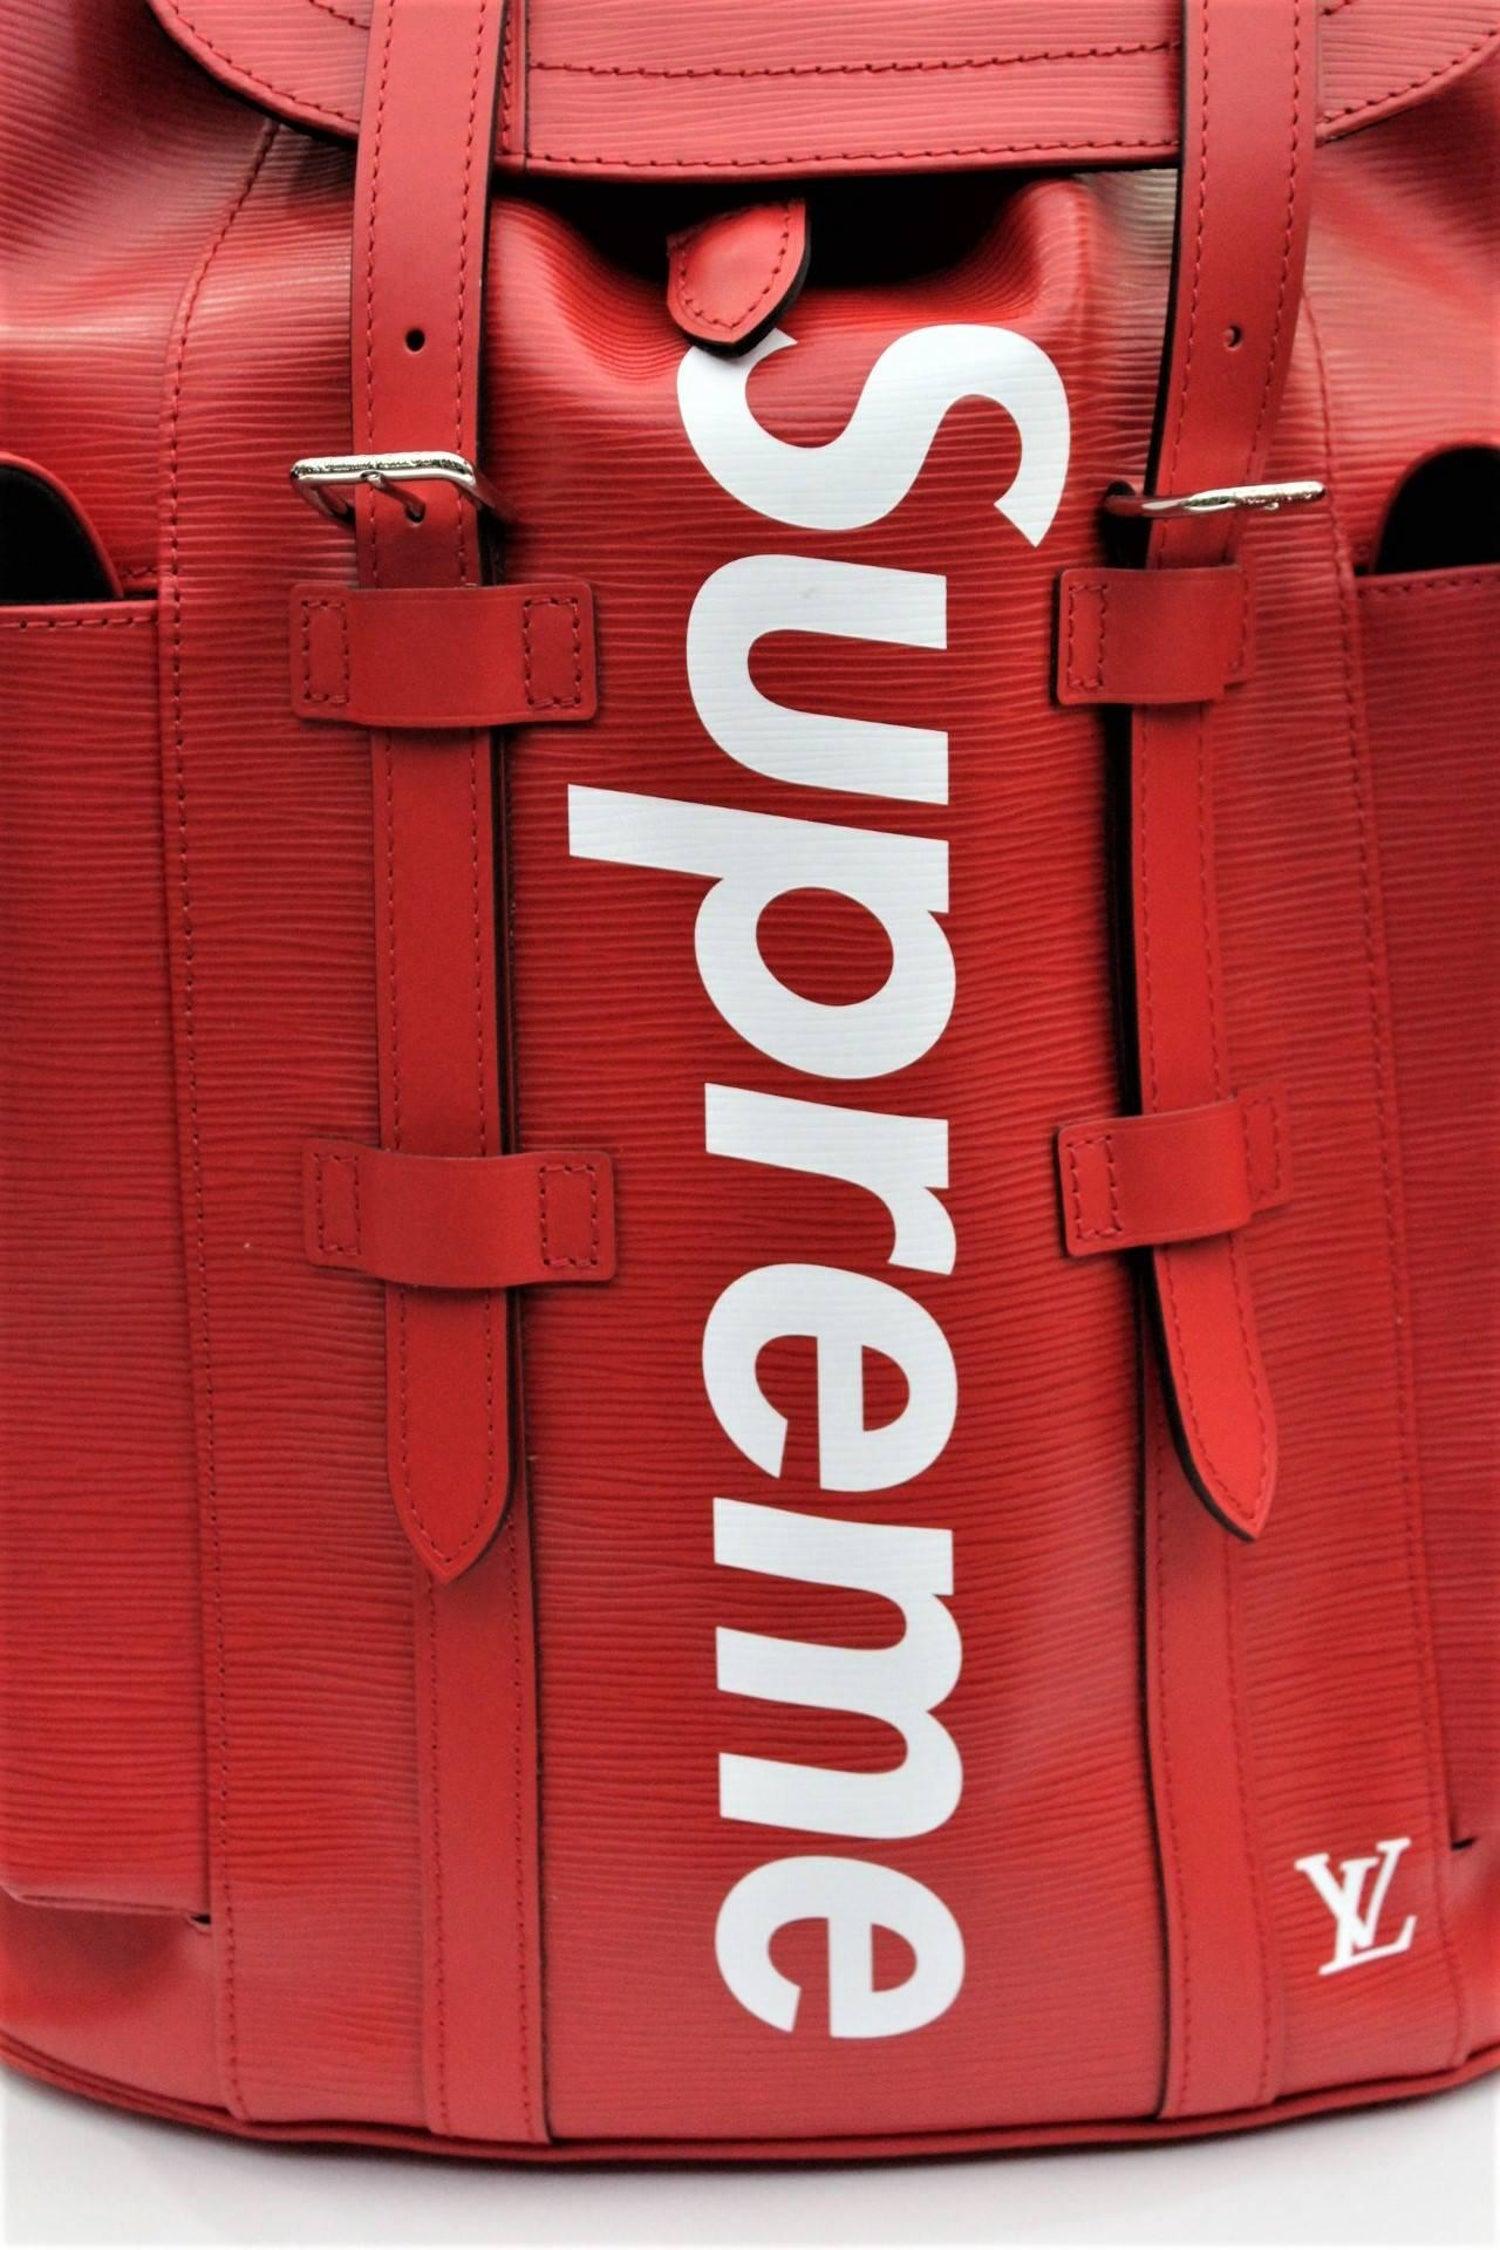 230eb886672ed6 Shiny Black Gucci Backpack – Patmo Technologies Limited